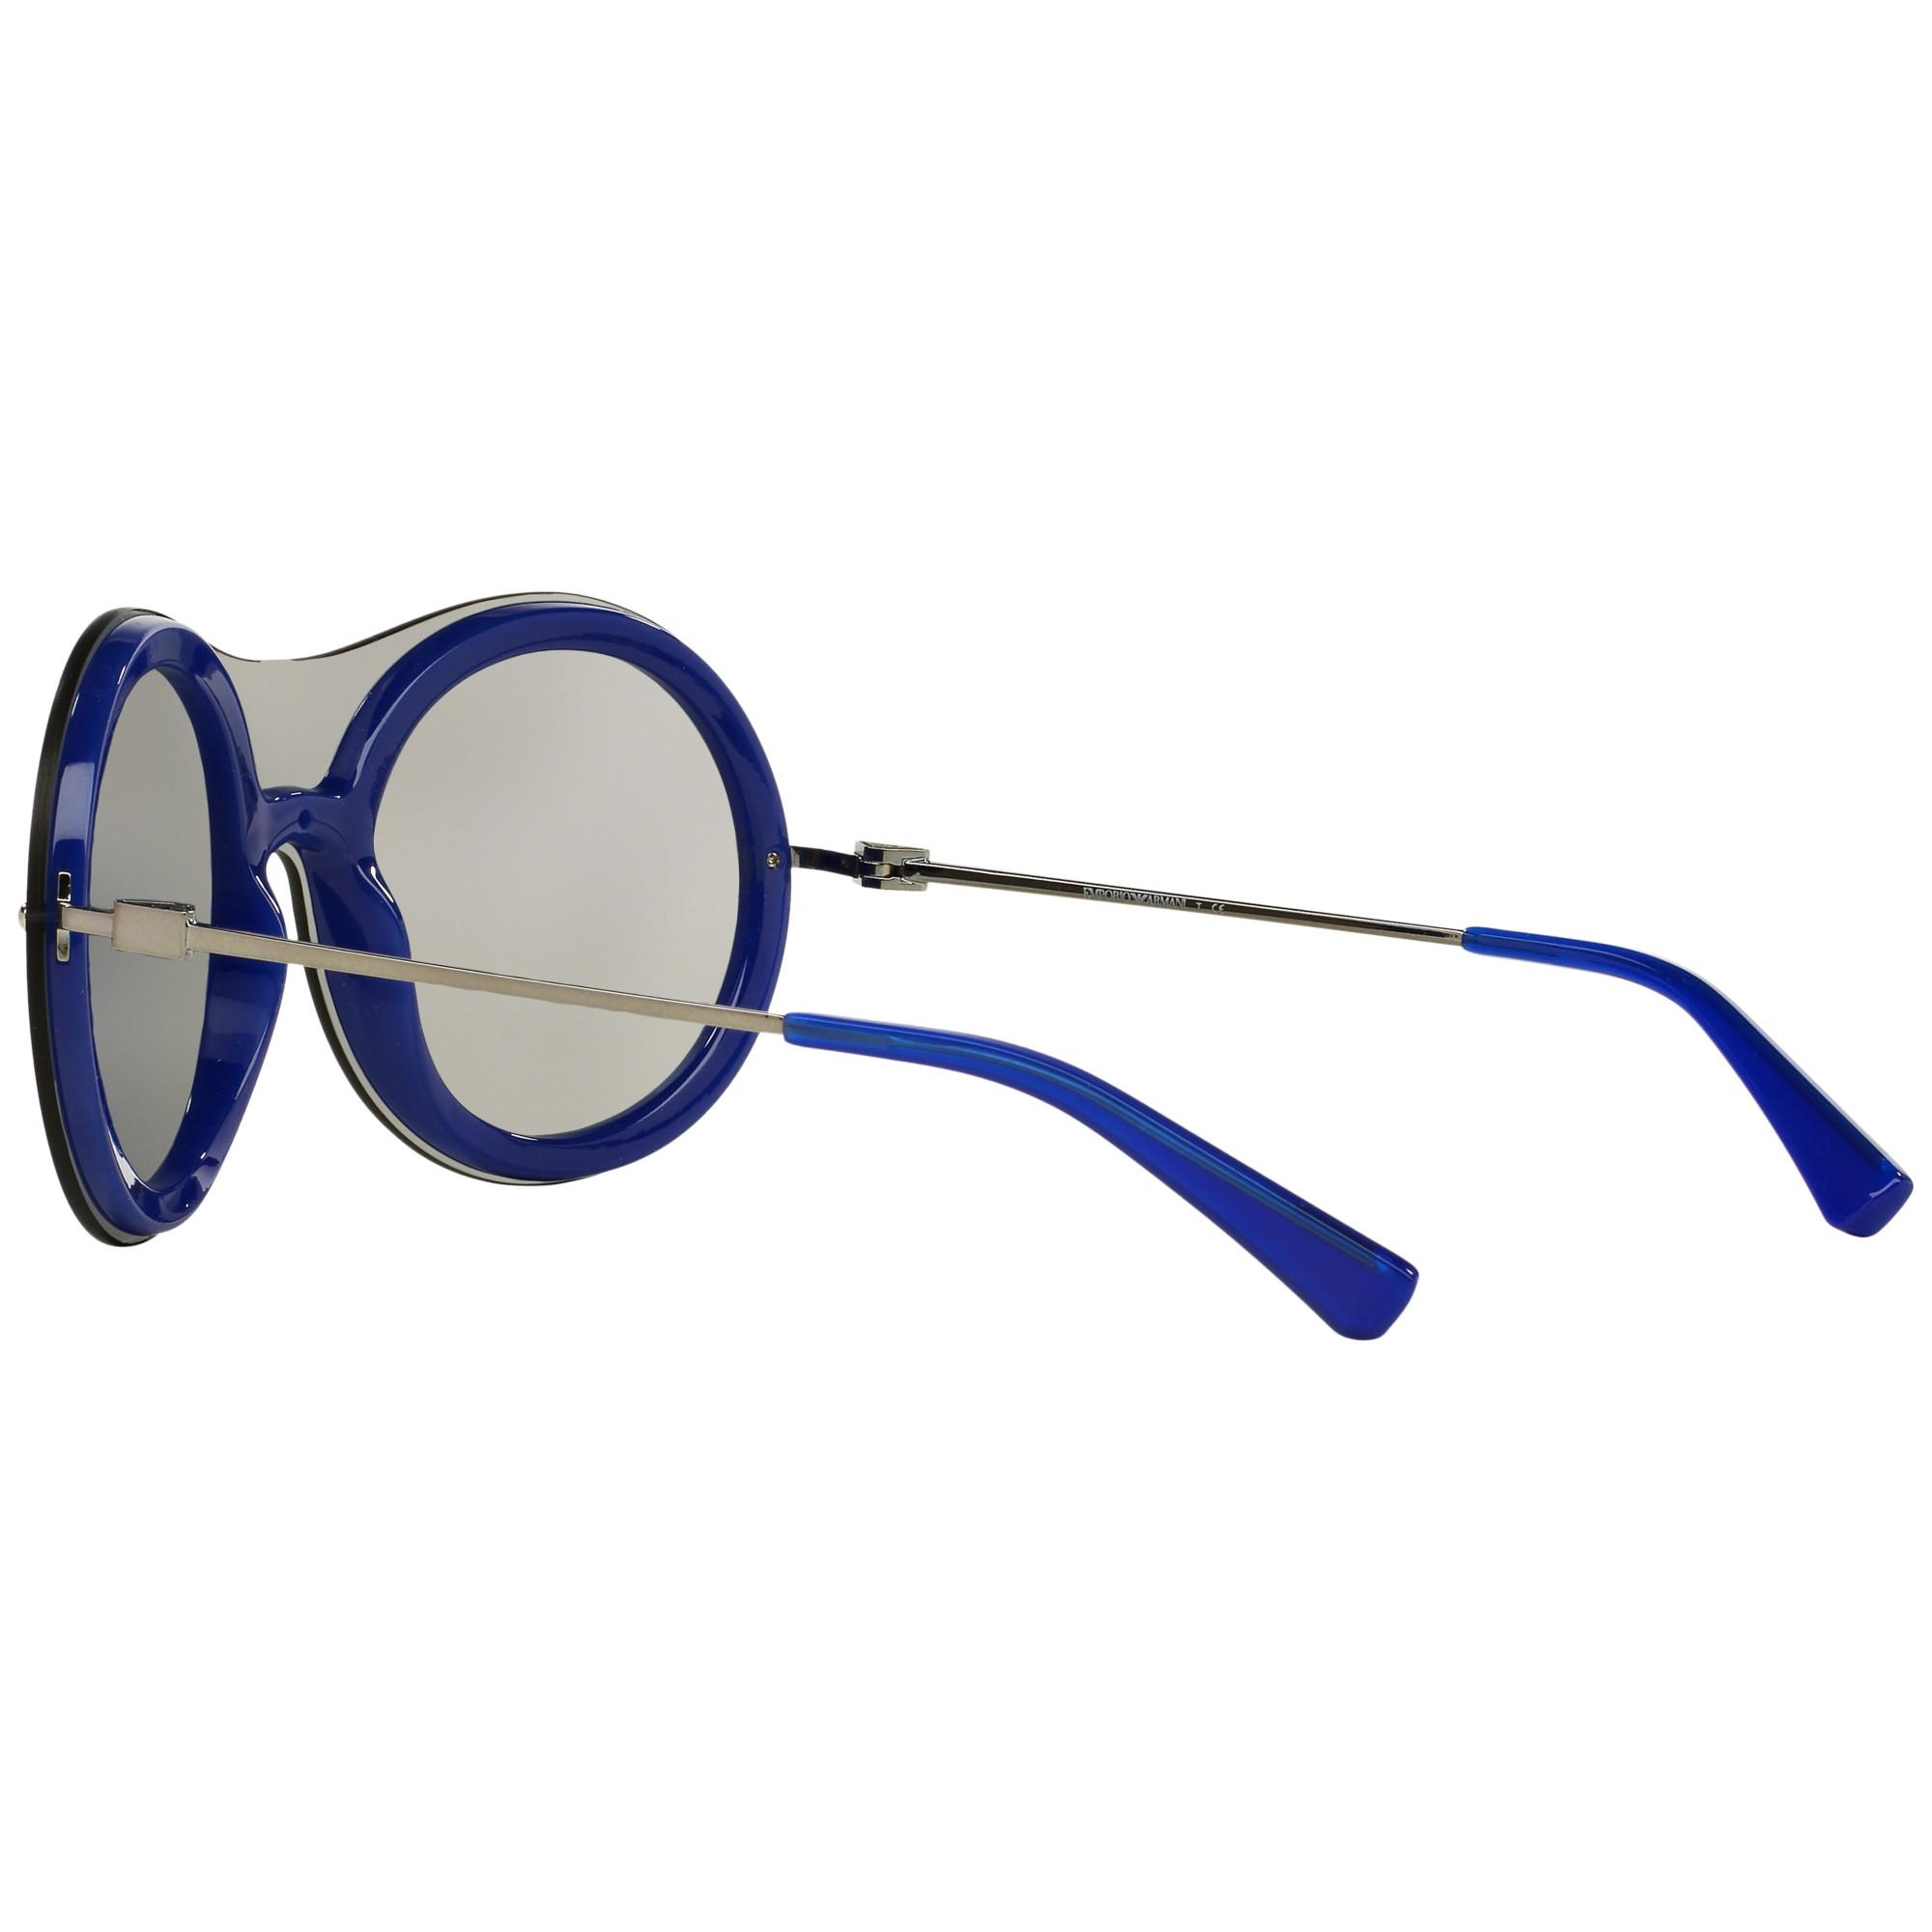 0c1bad57b76 Emporio Armani Ea4055 Round Framed Sunglasses in Gray - Lyst